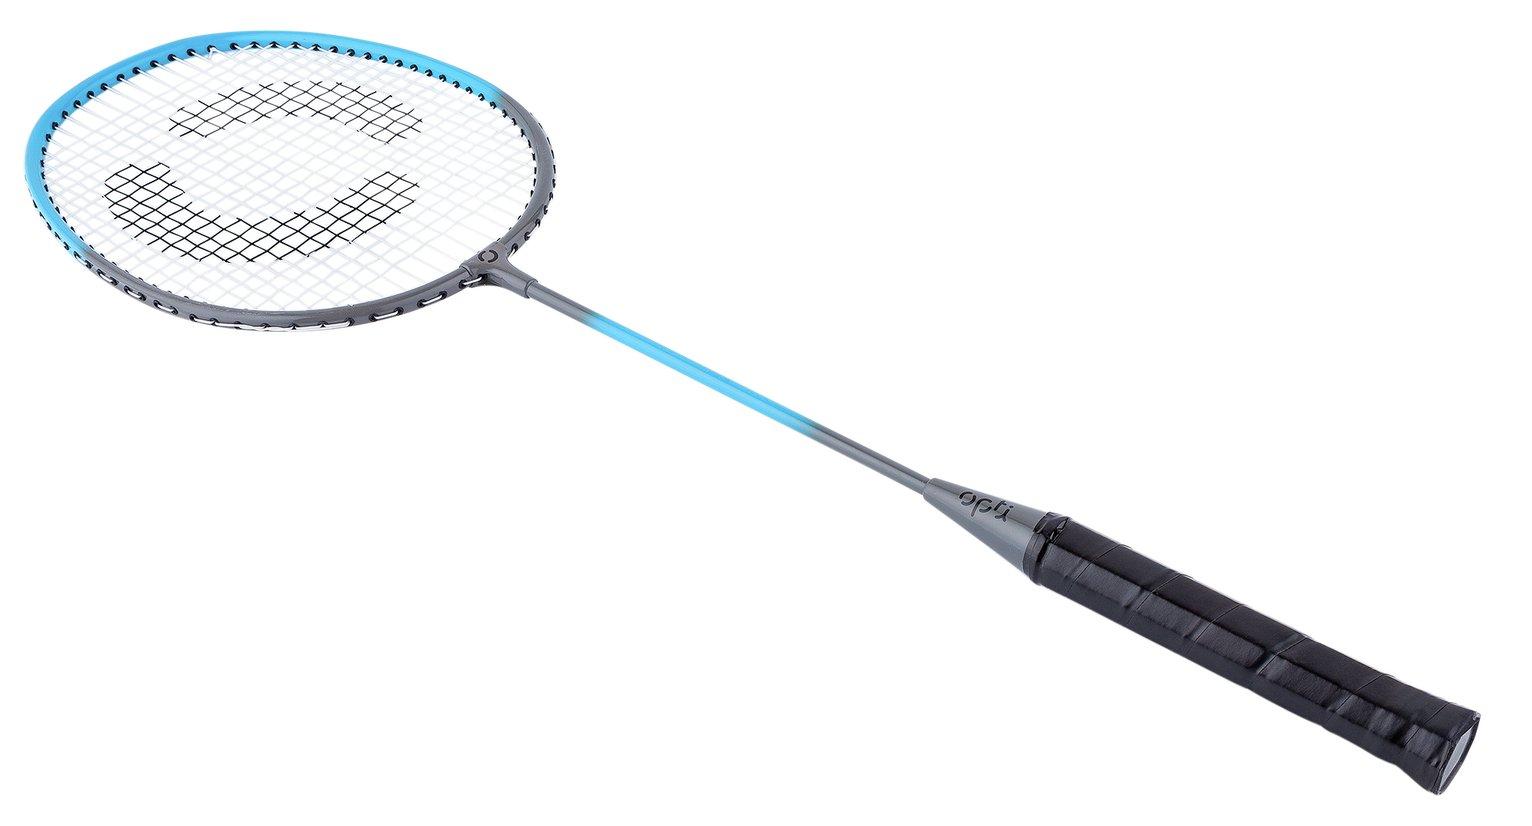 Opti Badminton Racket